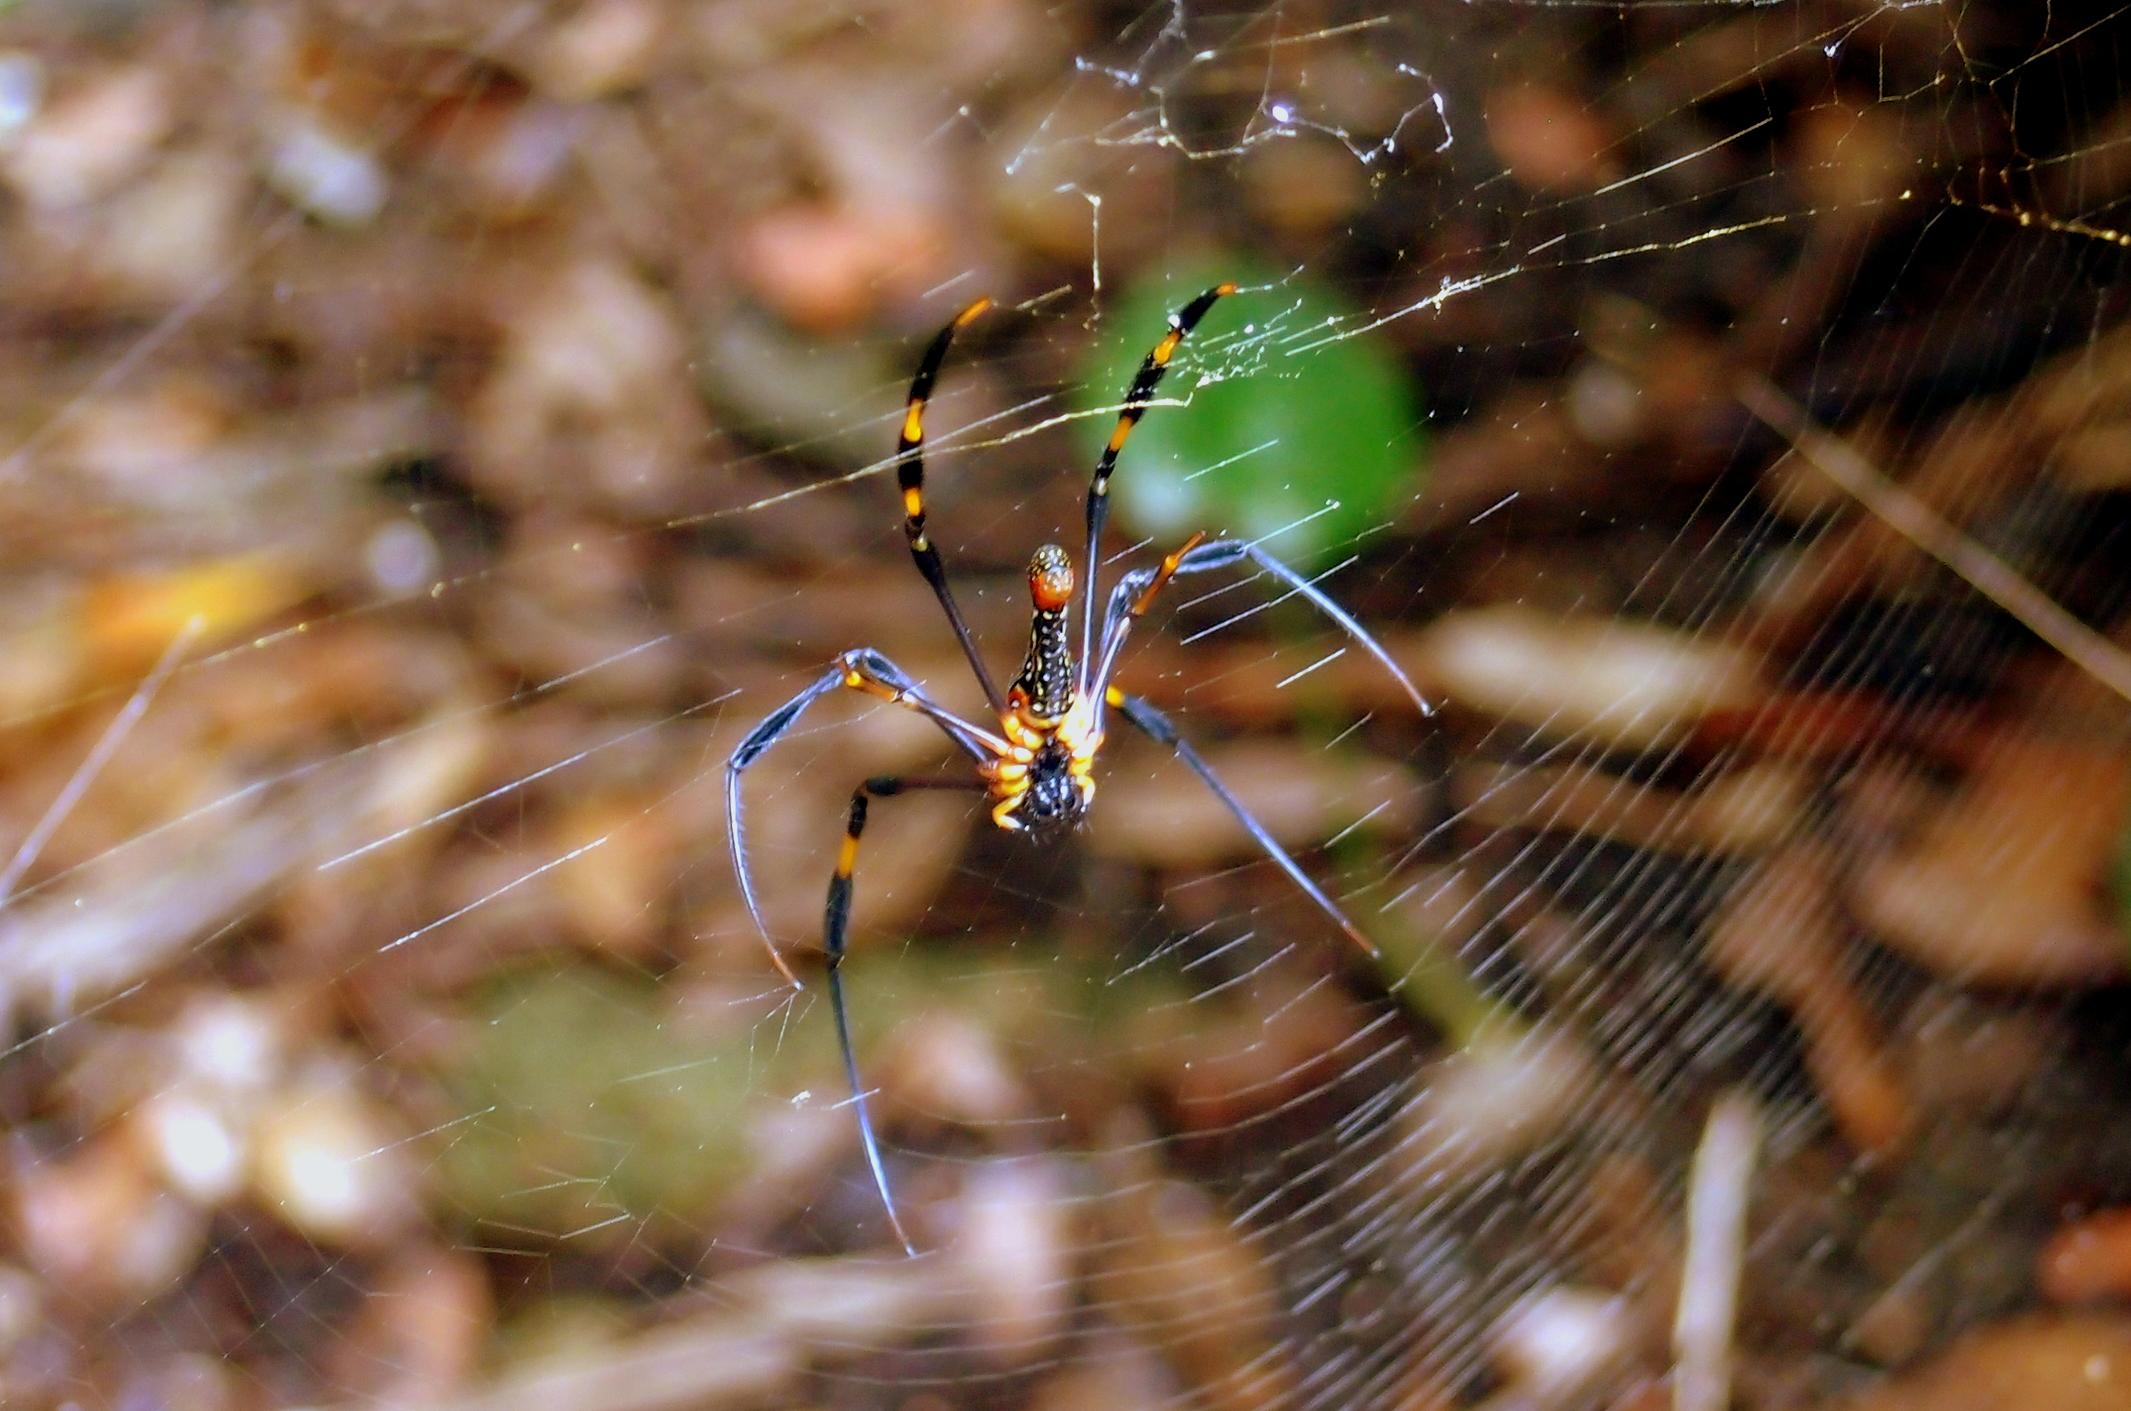 The stuff of nightmares... the Golden Orb spider